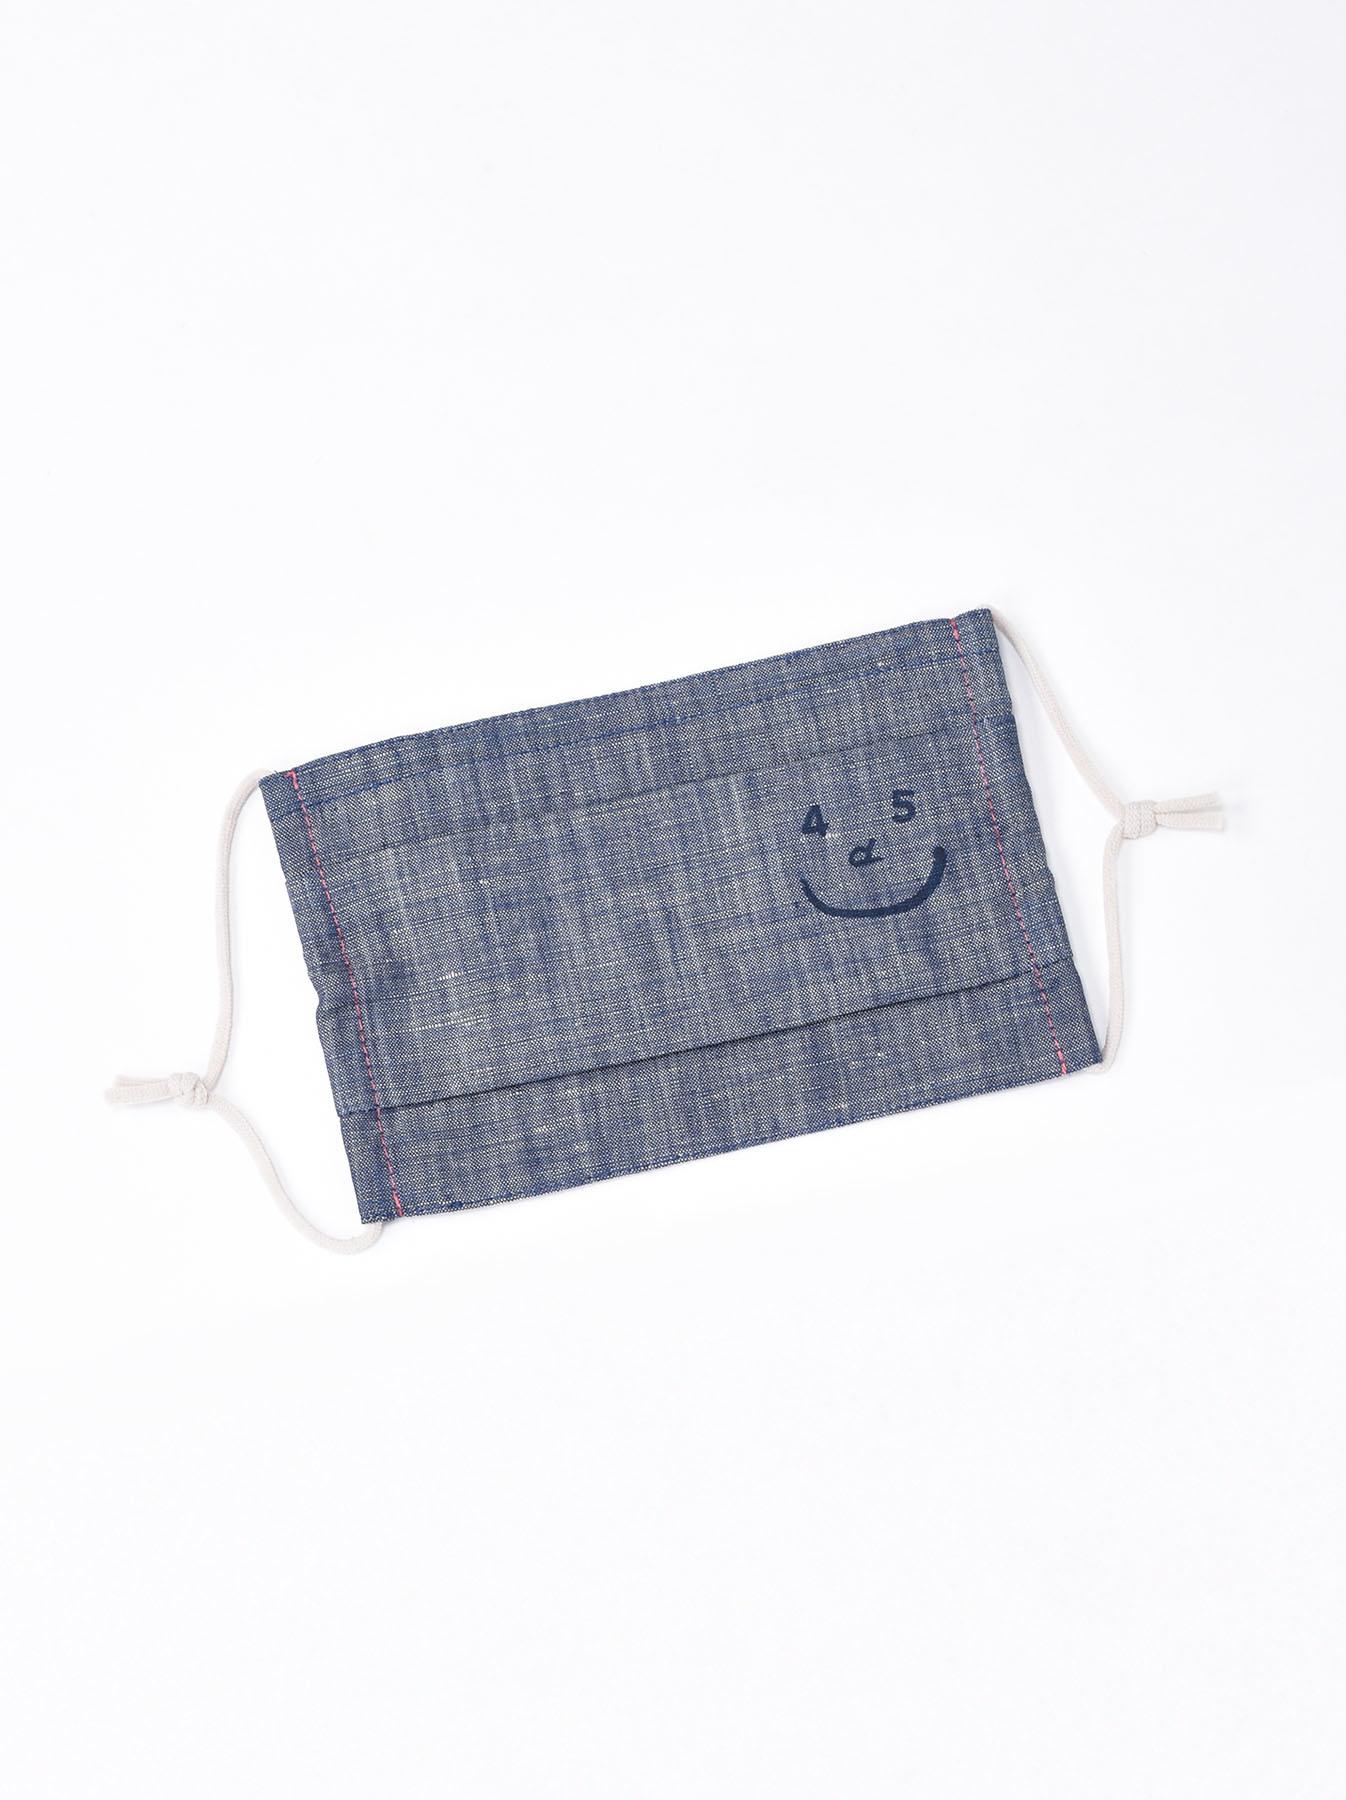 Smiling Khadi Masks-1